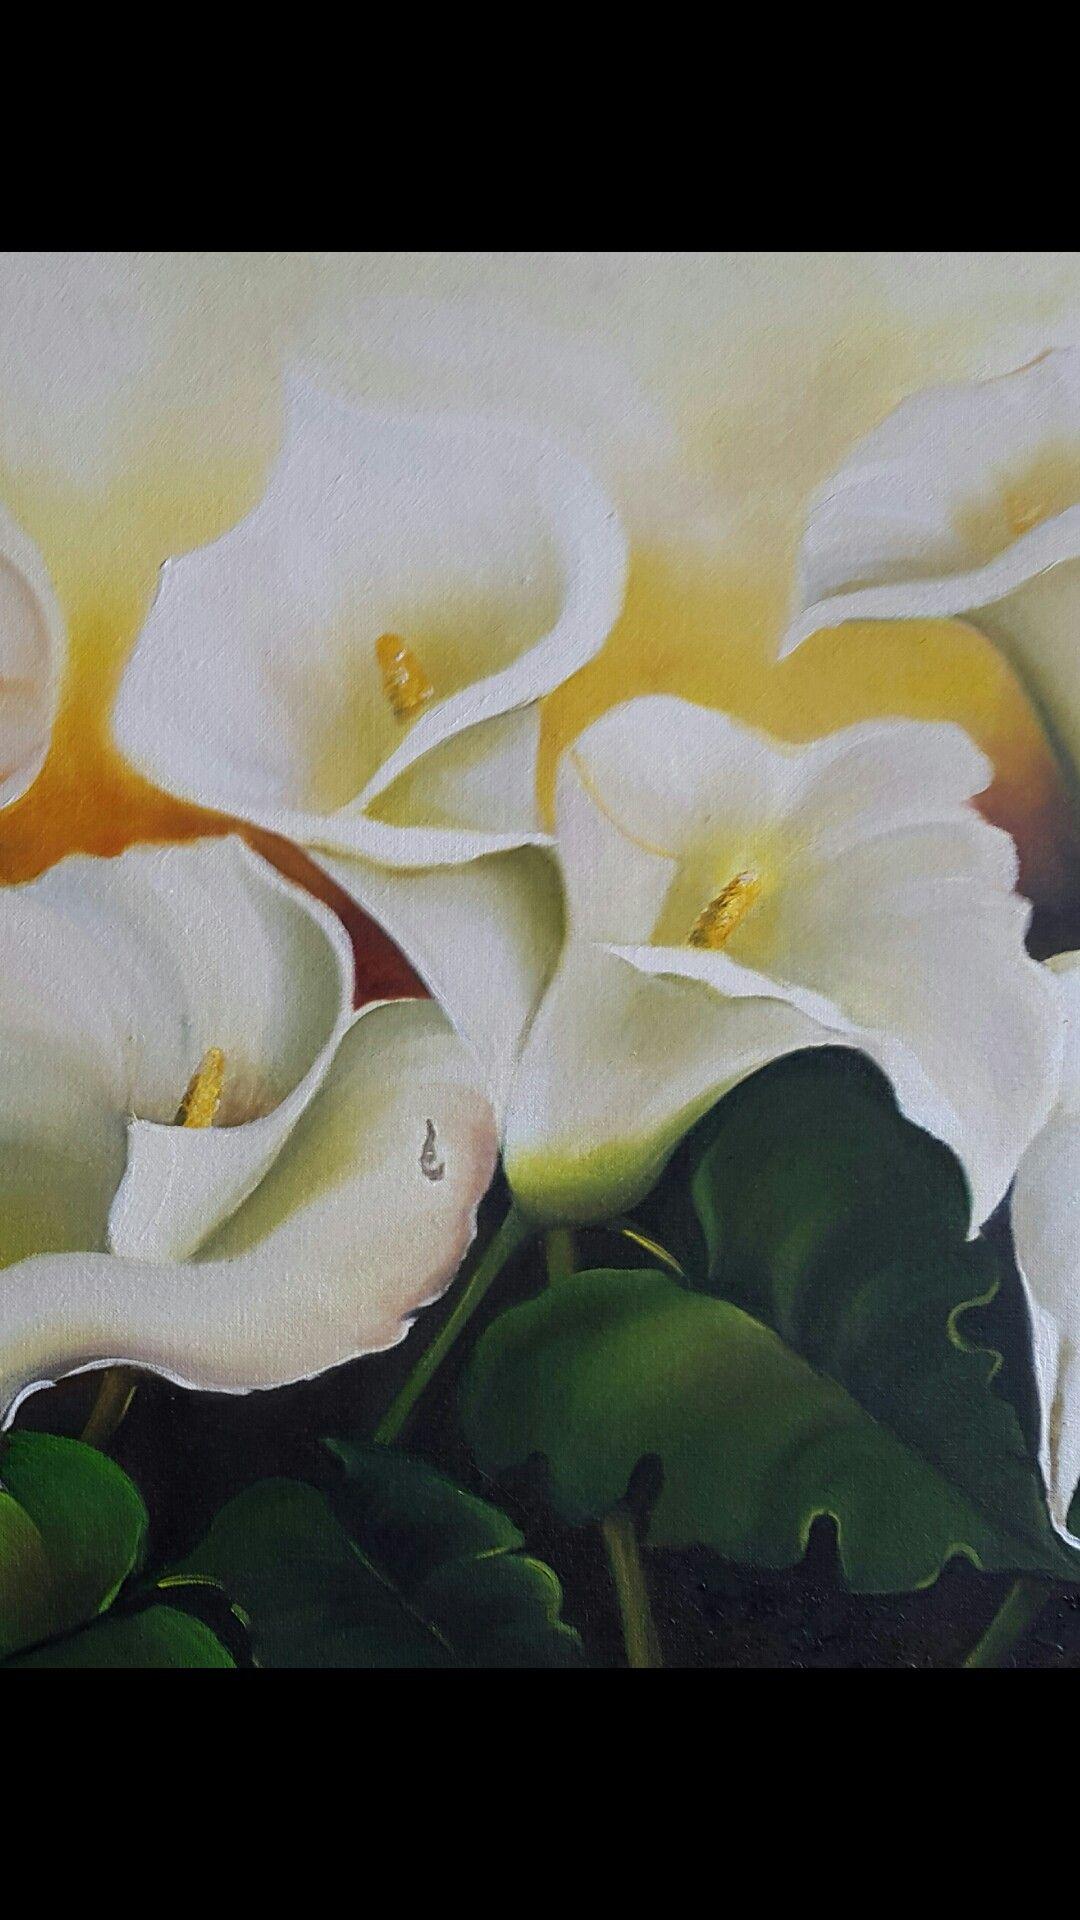 Pin By Mara Segura On Cuadros Pinterest Flower Paintings